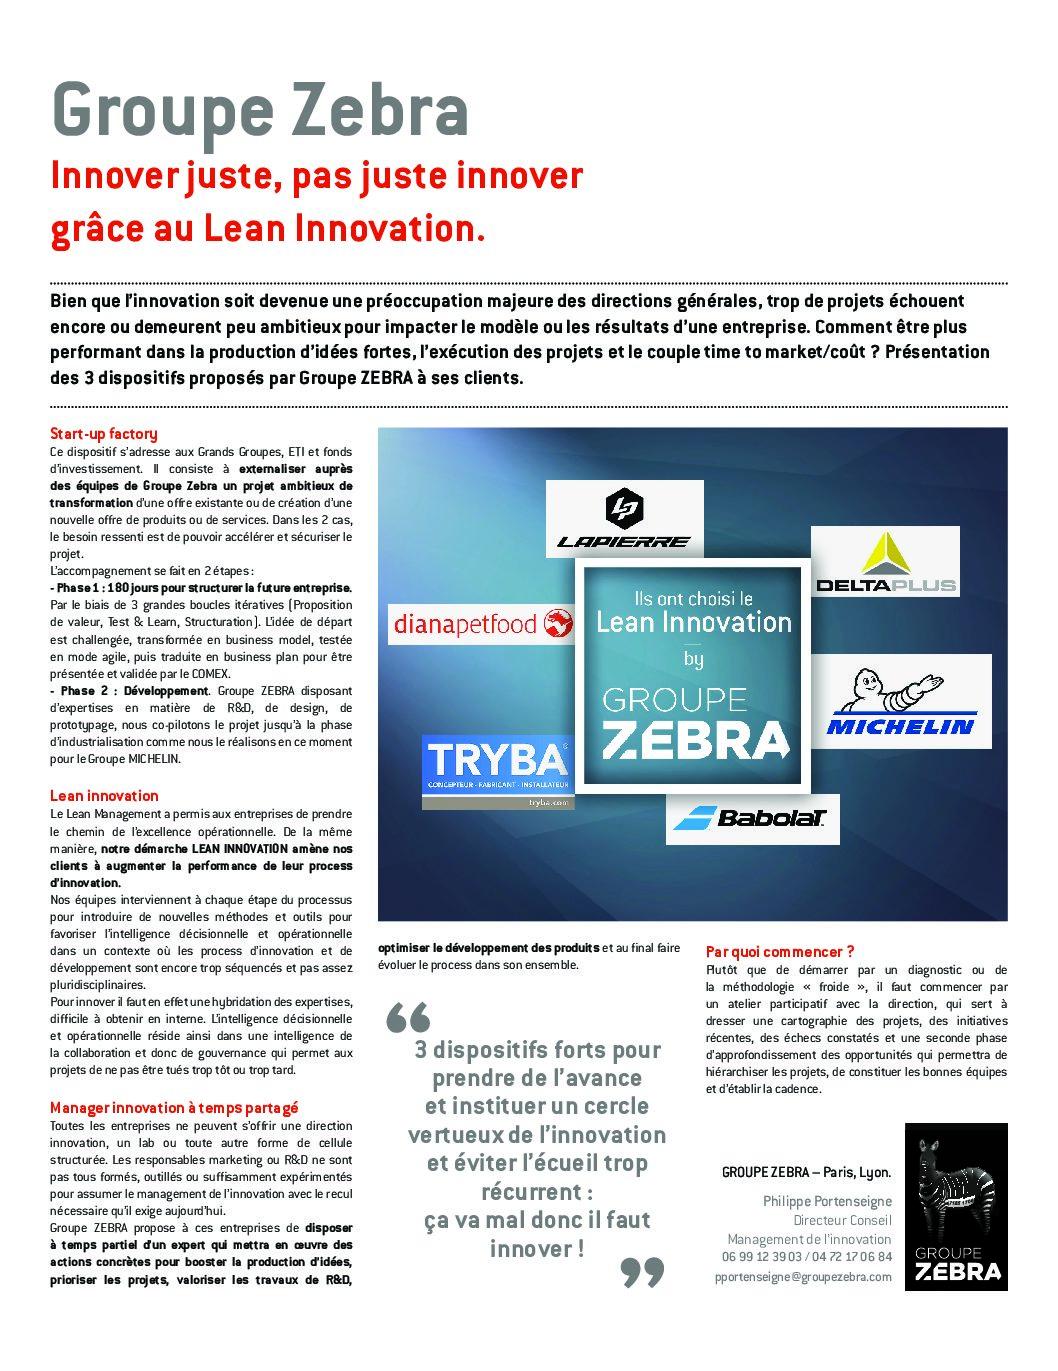 Groupe Zebra : Innover juste, pas juste innover grâce au Lean Innovation.